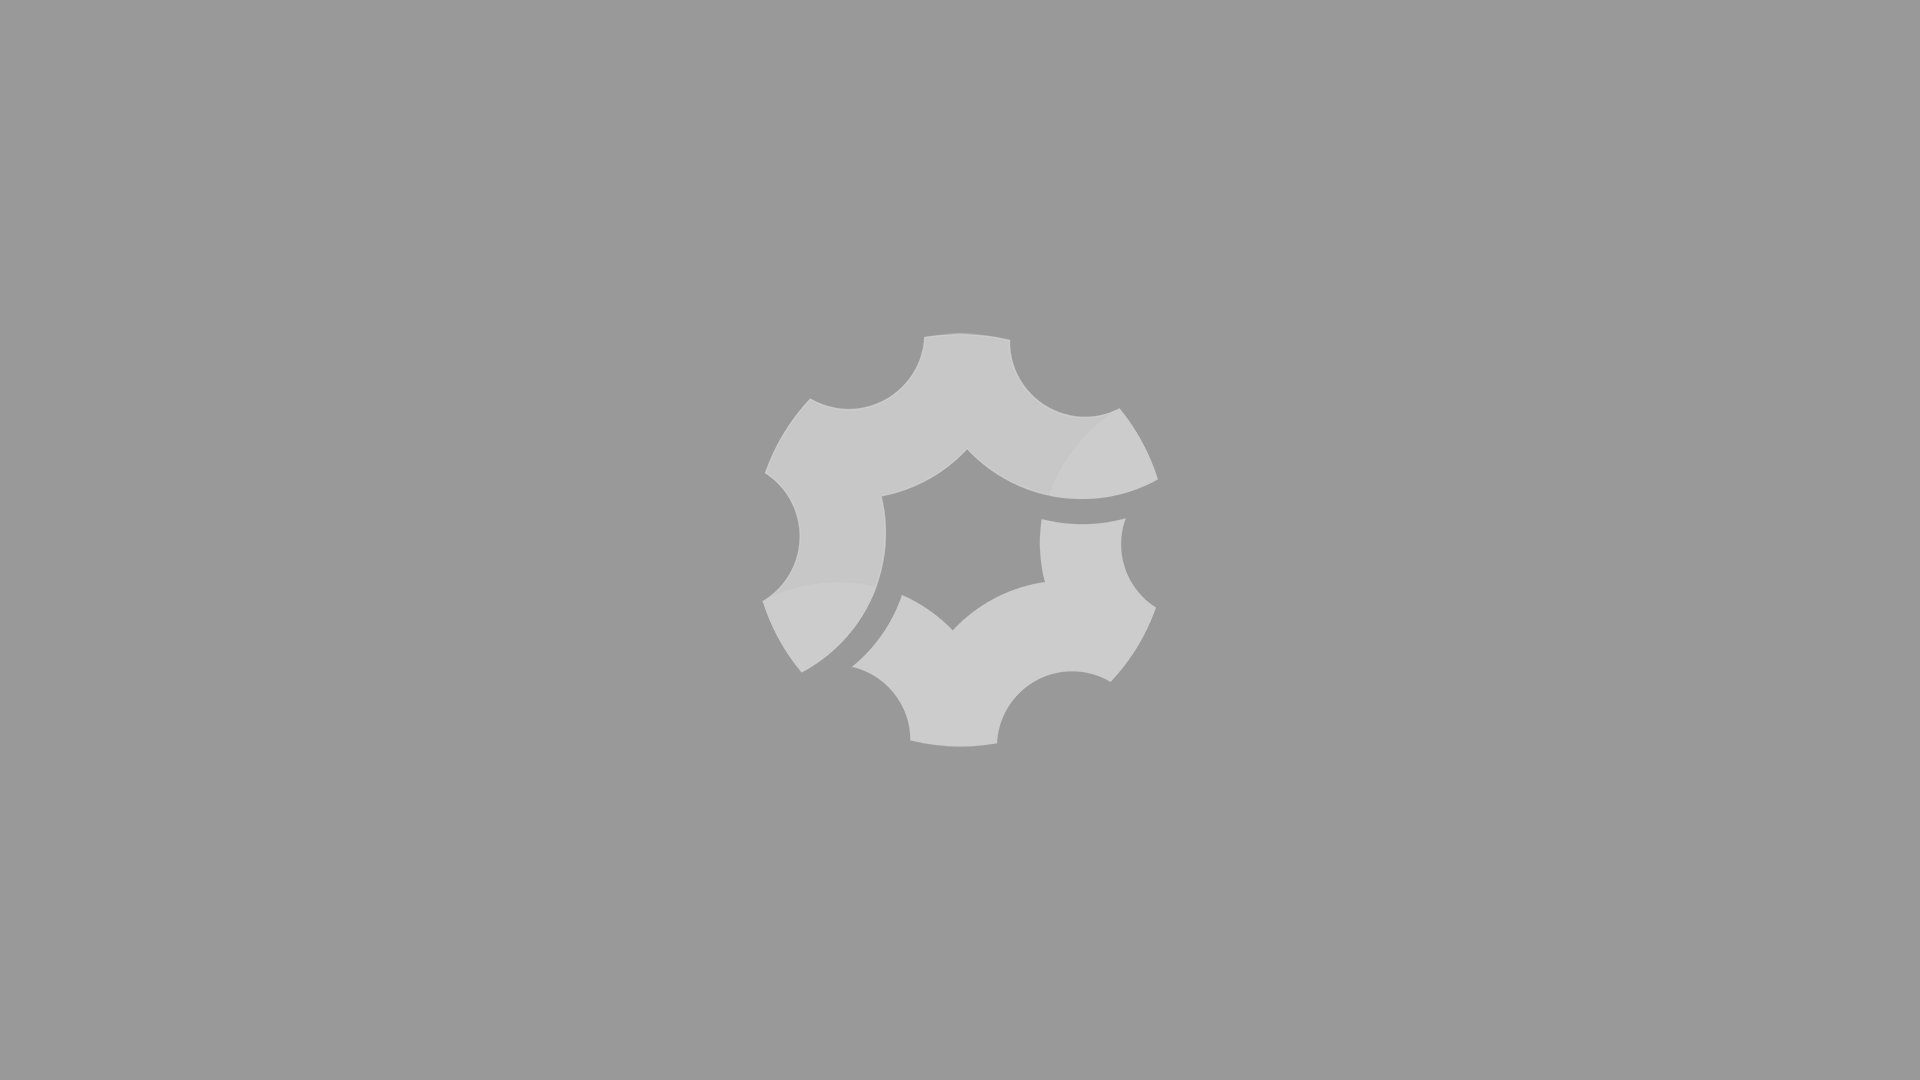 caldera_full_overview.PNG